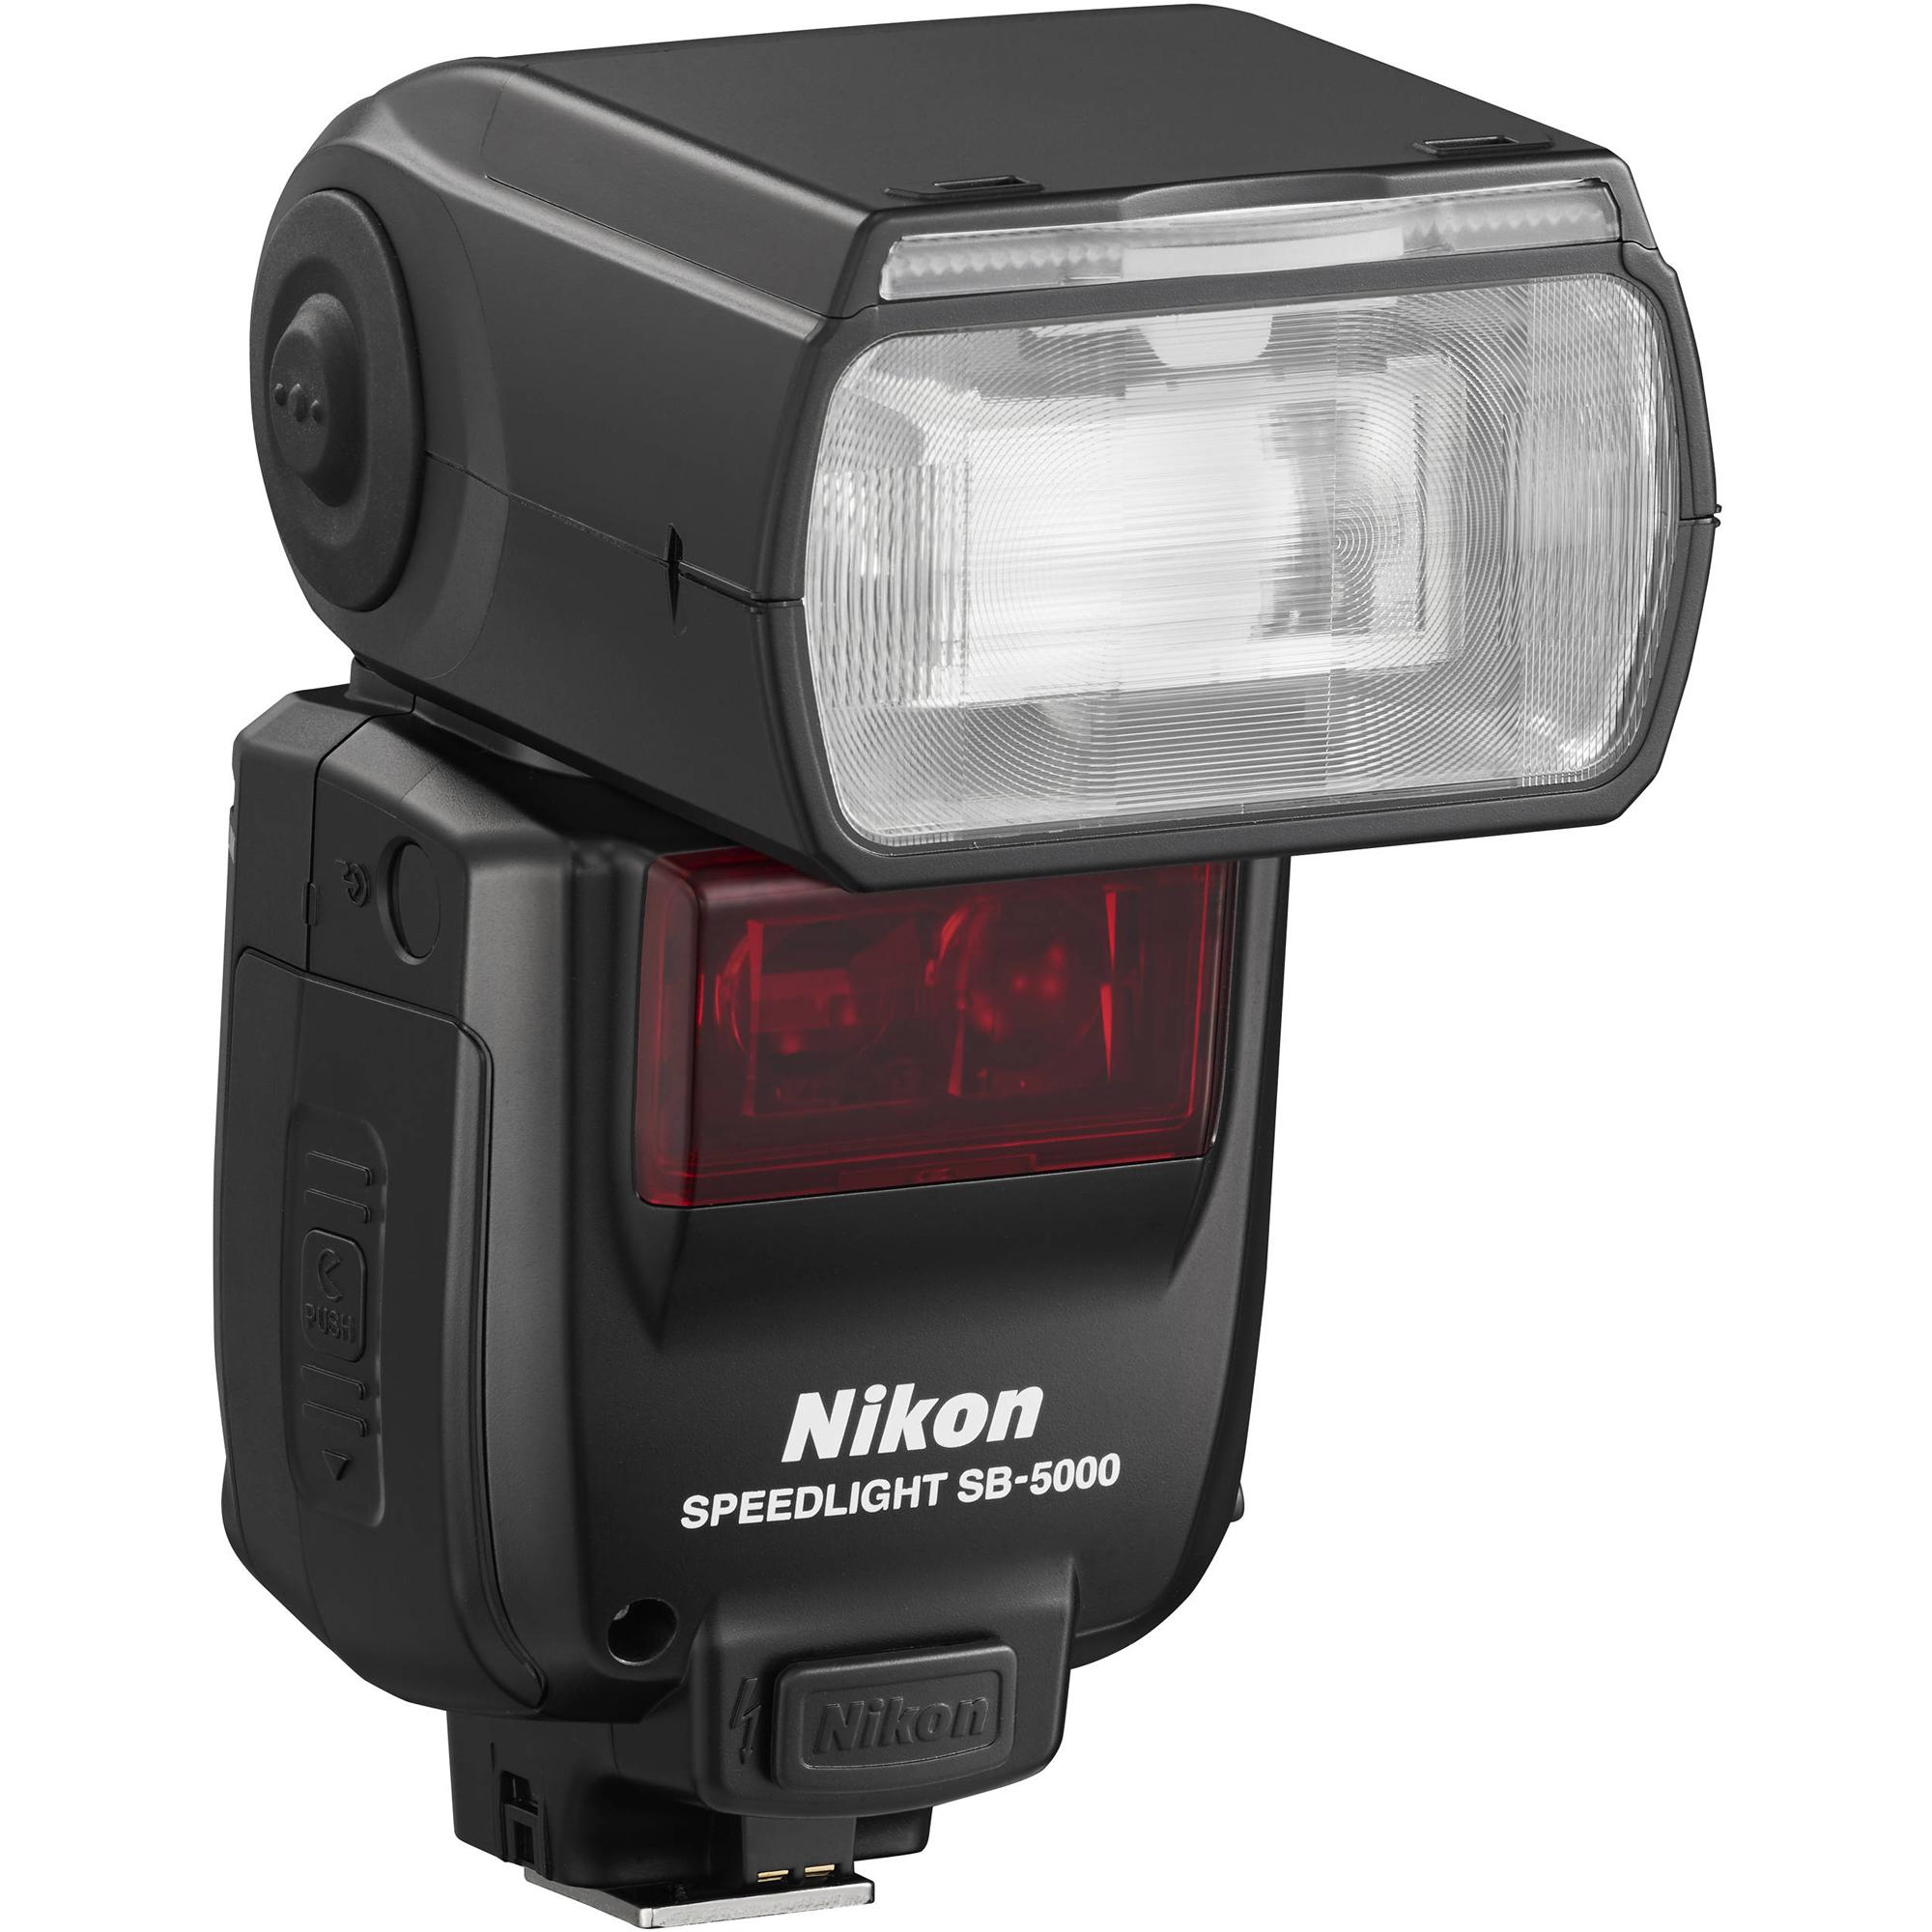 Flash clipart video shoot Speedlight B&H for Nikon Gear